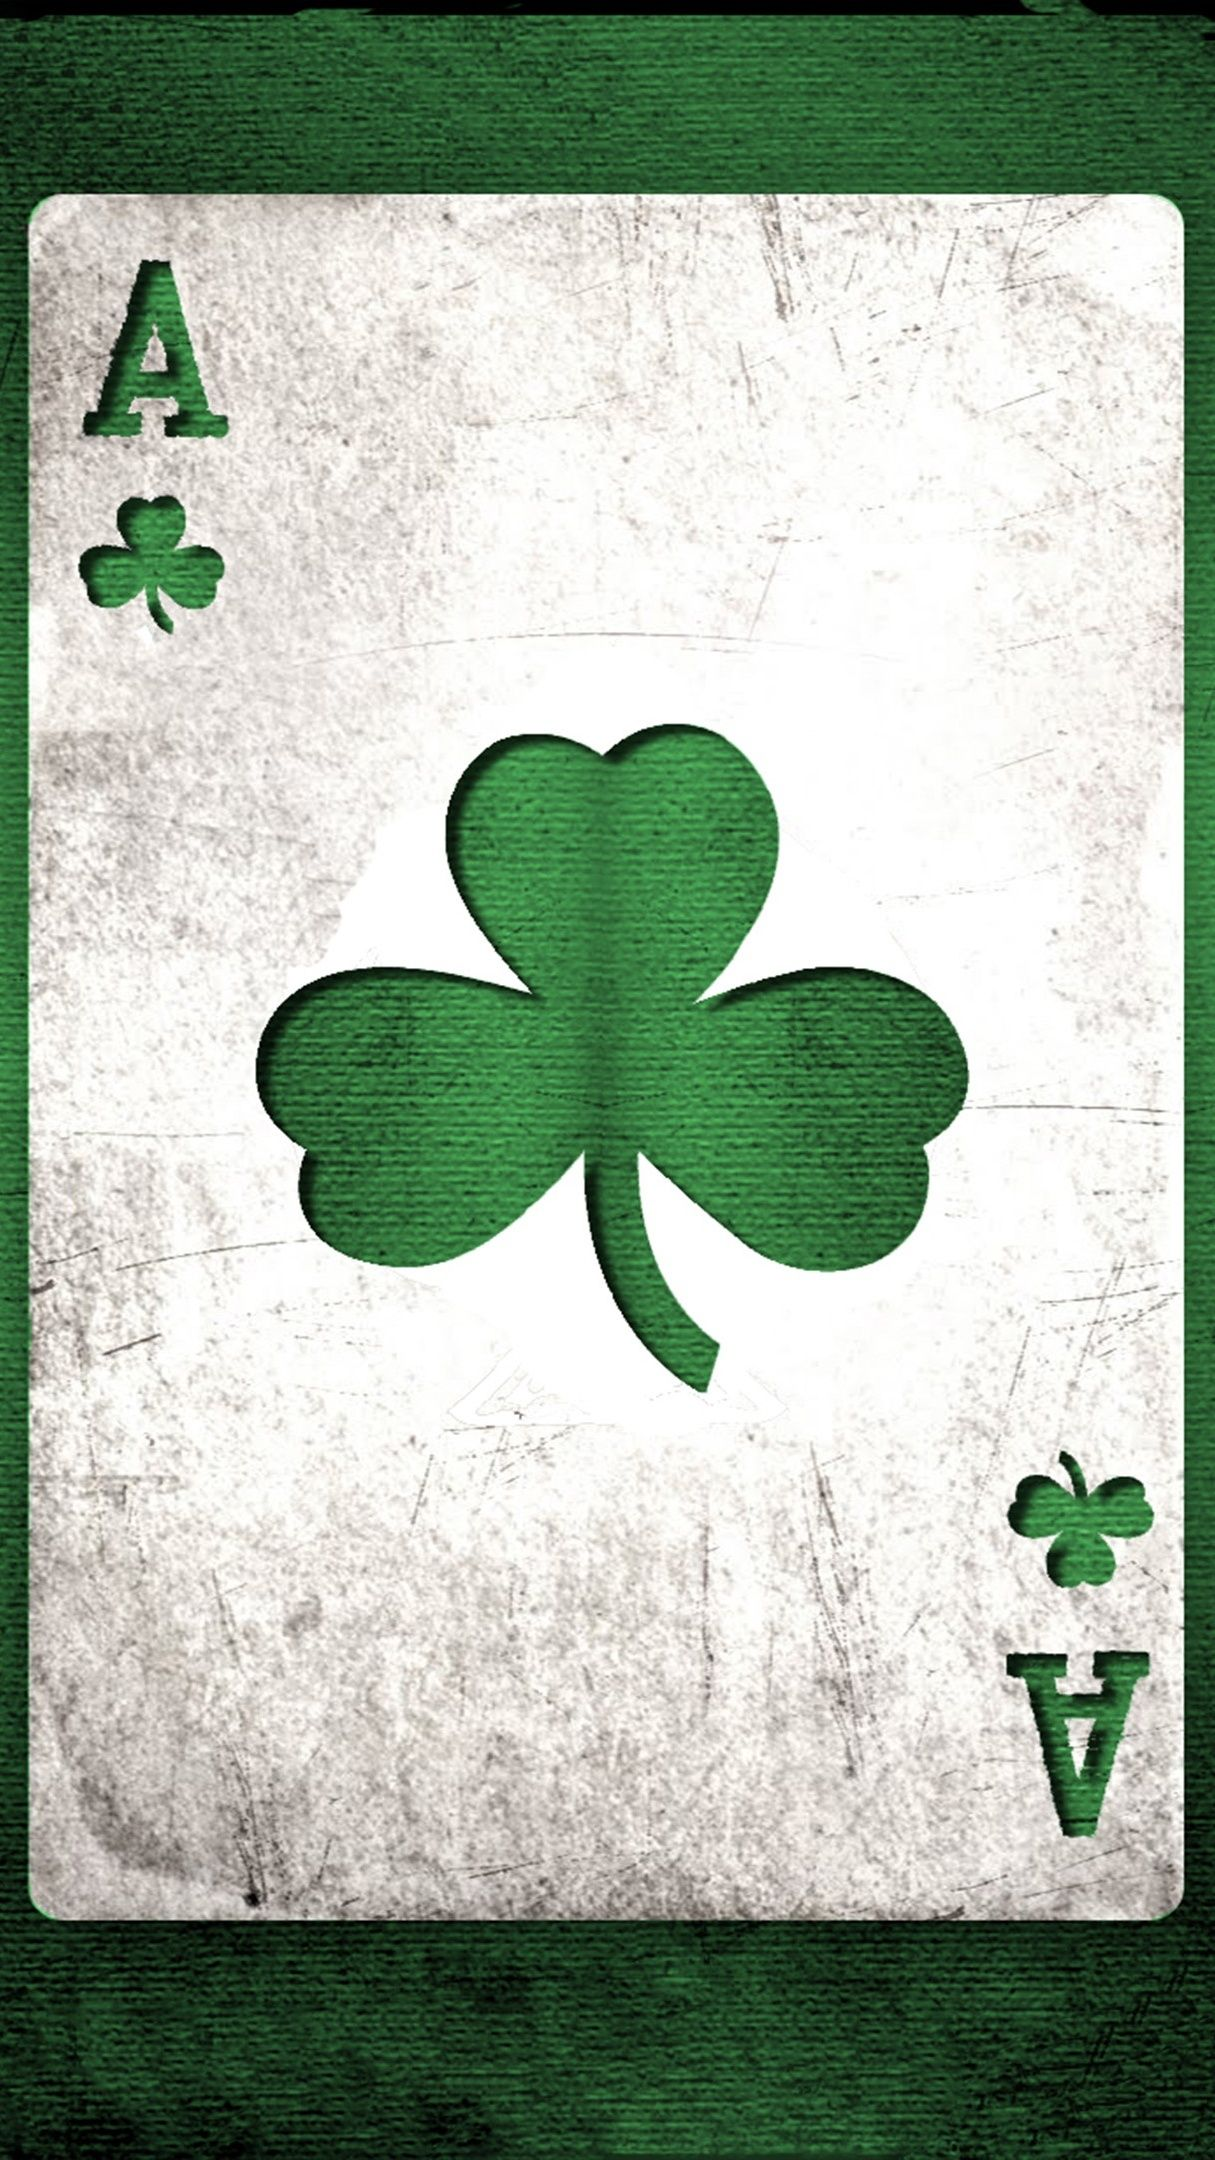 Cool Boston Celtics Wallpaper Best Iphone Wallpaper Boston Celtics Wallpaper Iphone Wallpaper Card Art